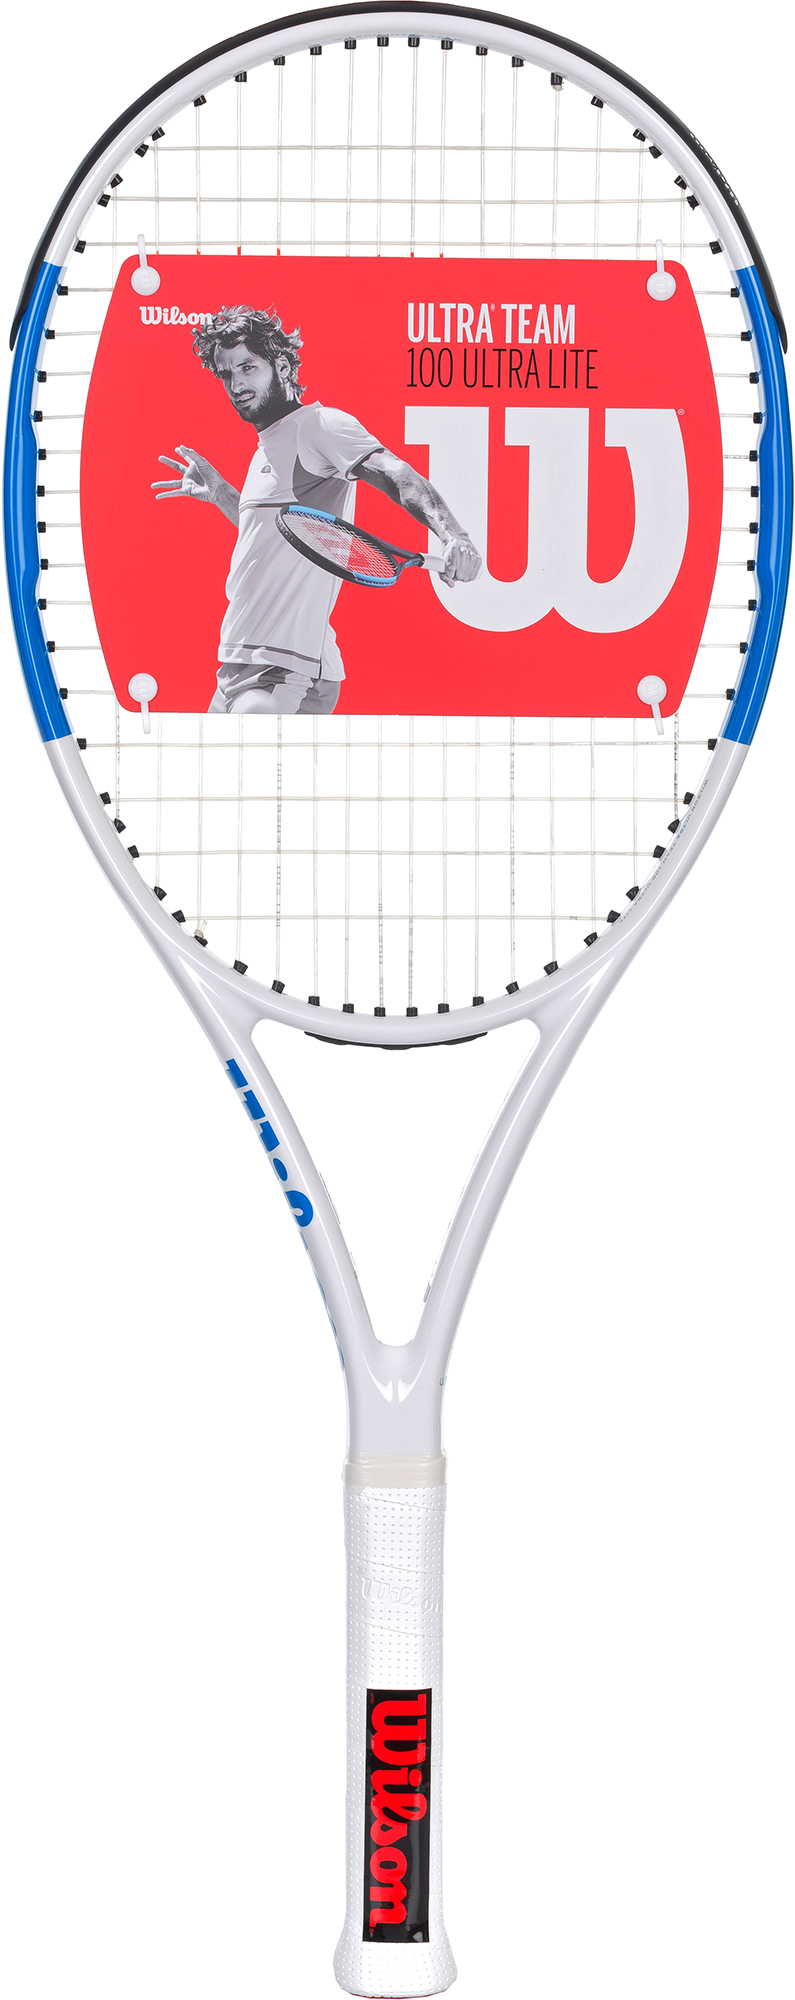 Wilson Ракетка для большого тенниса Wilson Ultra Team 100 UL, размер 2 wilson набор мячей для большого тенниса wilson australian open 3 ball can размер без размера